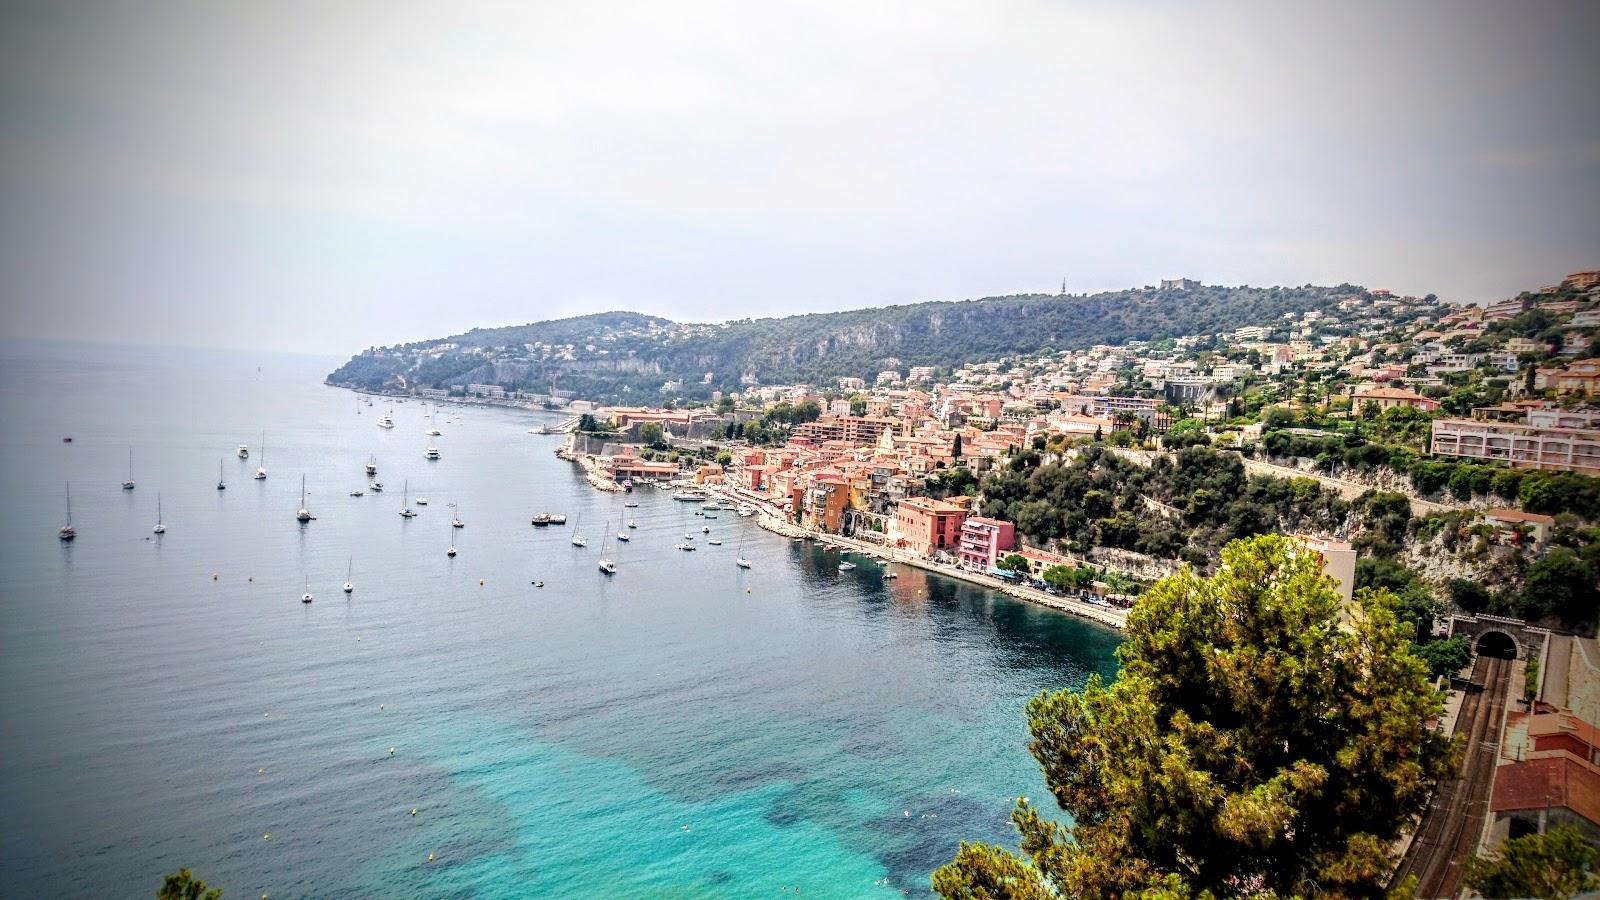 3 tygodnie w siodle: Nasz Eurotrip 2016. Dzień 7 - Monte Carlo w Monako, Nicea, Carbuta i paella w Sotto La Quercia